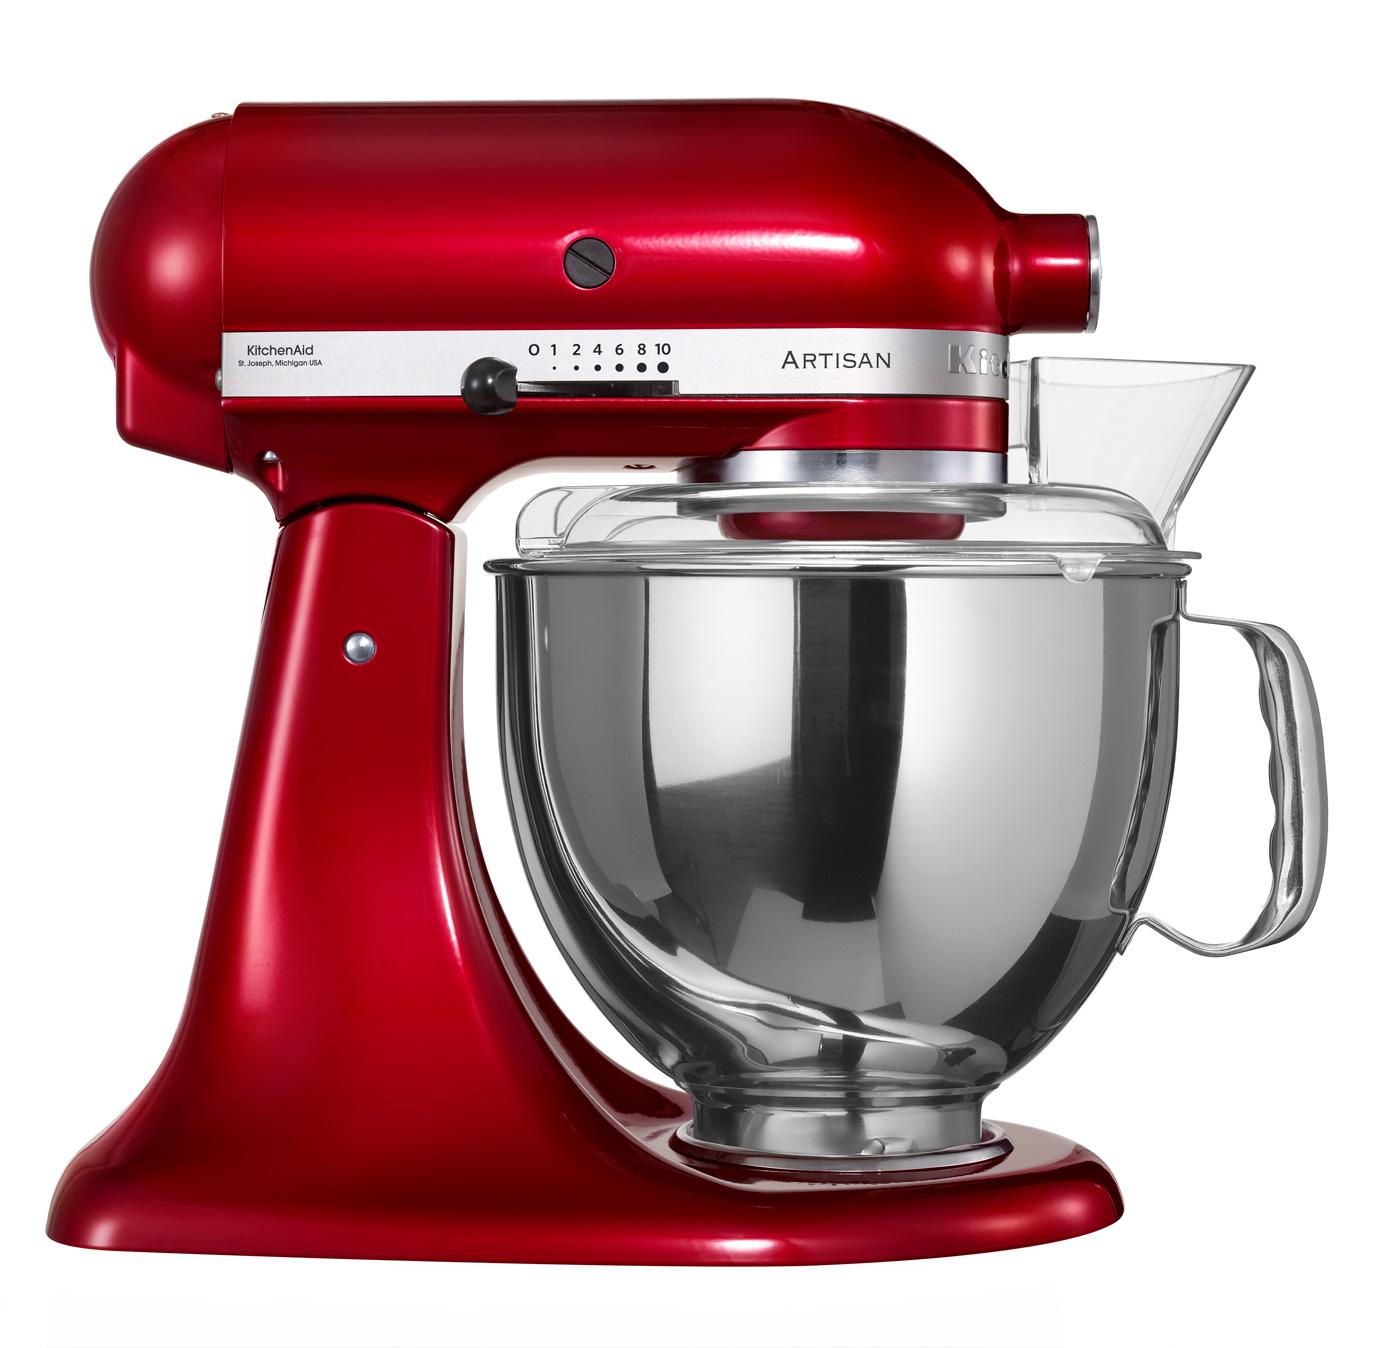 kitchen aid standing mixer ninja ultima system kitchenaid artisan mixers for everyday cooks  philip